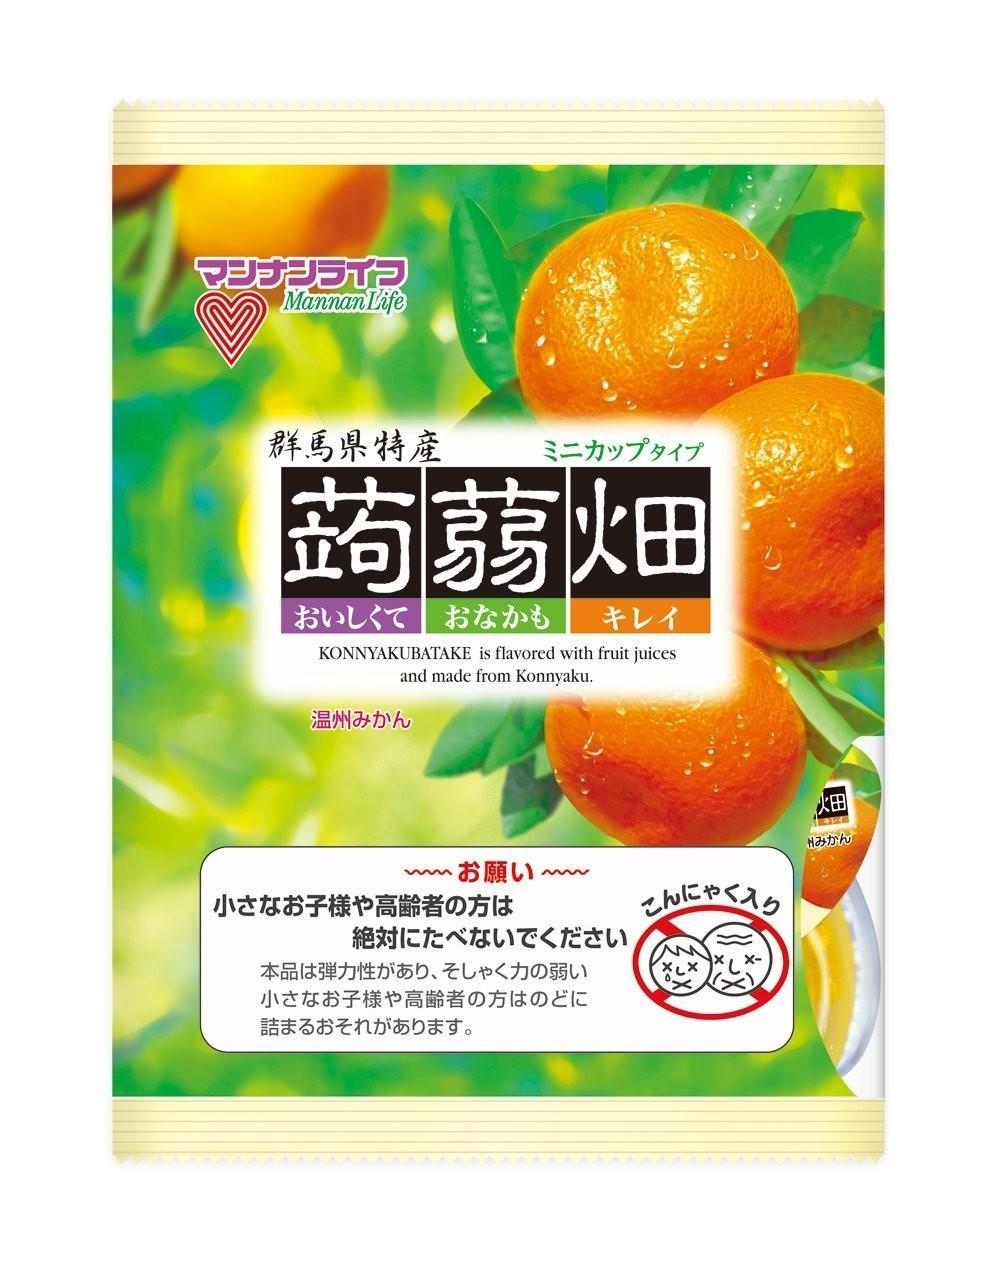 "Mannan Life ""Konnyaku Batake, Mandarin orange, mikan. flavor"" Konjac Fruits Jelly, 25g x 12 pc"